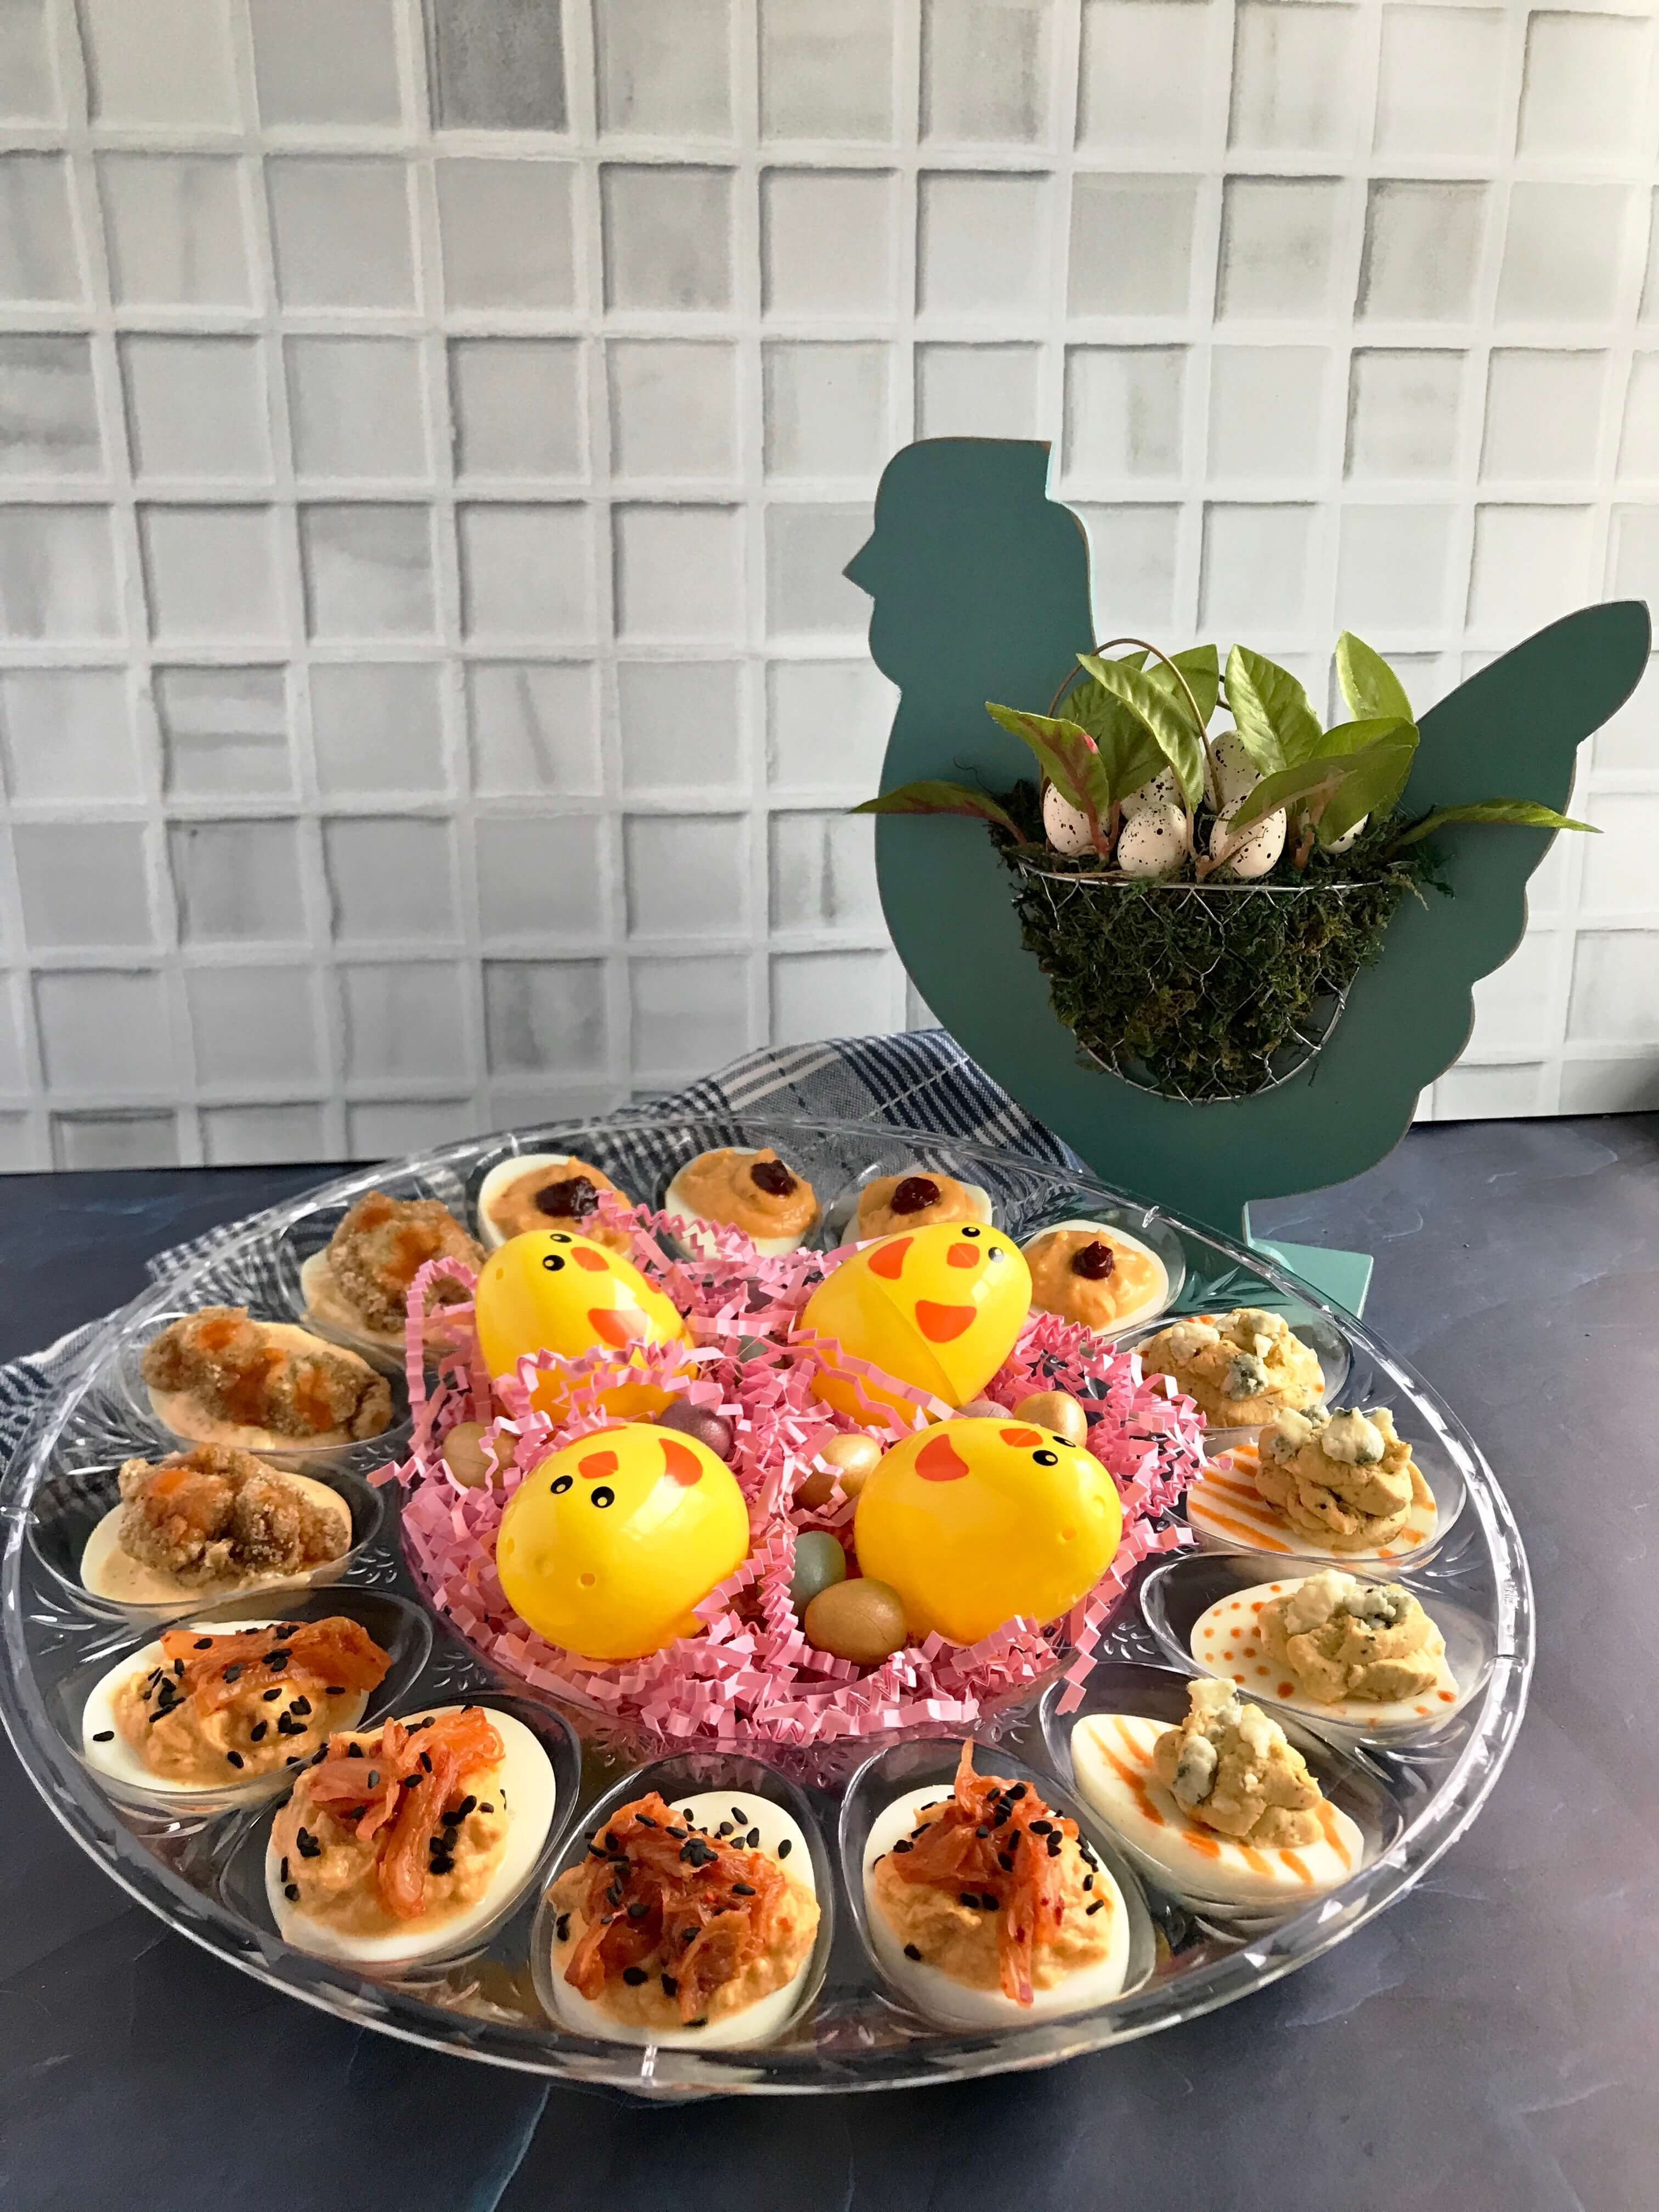 Spicy Deviled Egg Recipes | Easter Hardboiled Egg Leftovers | Nutrition Nuptials | Mandy Enright MS RDN RYT